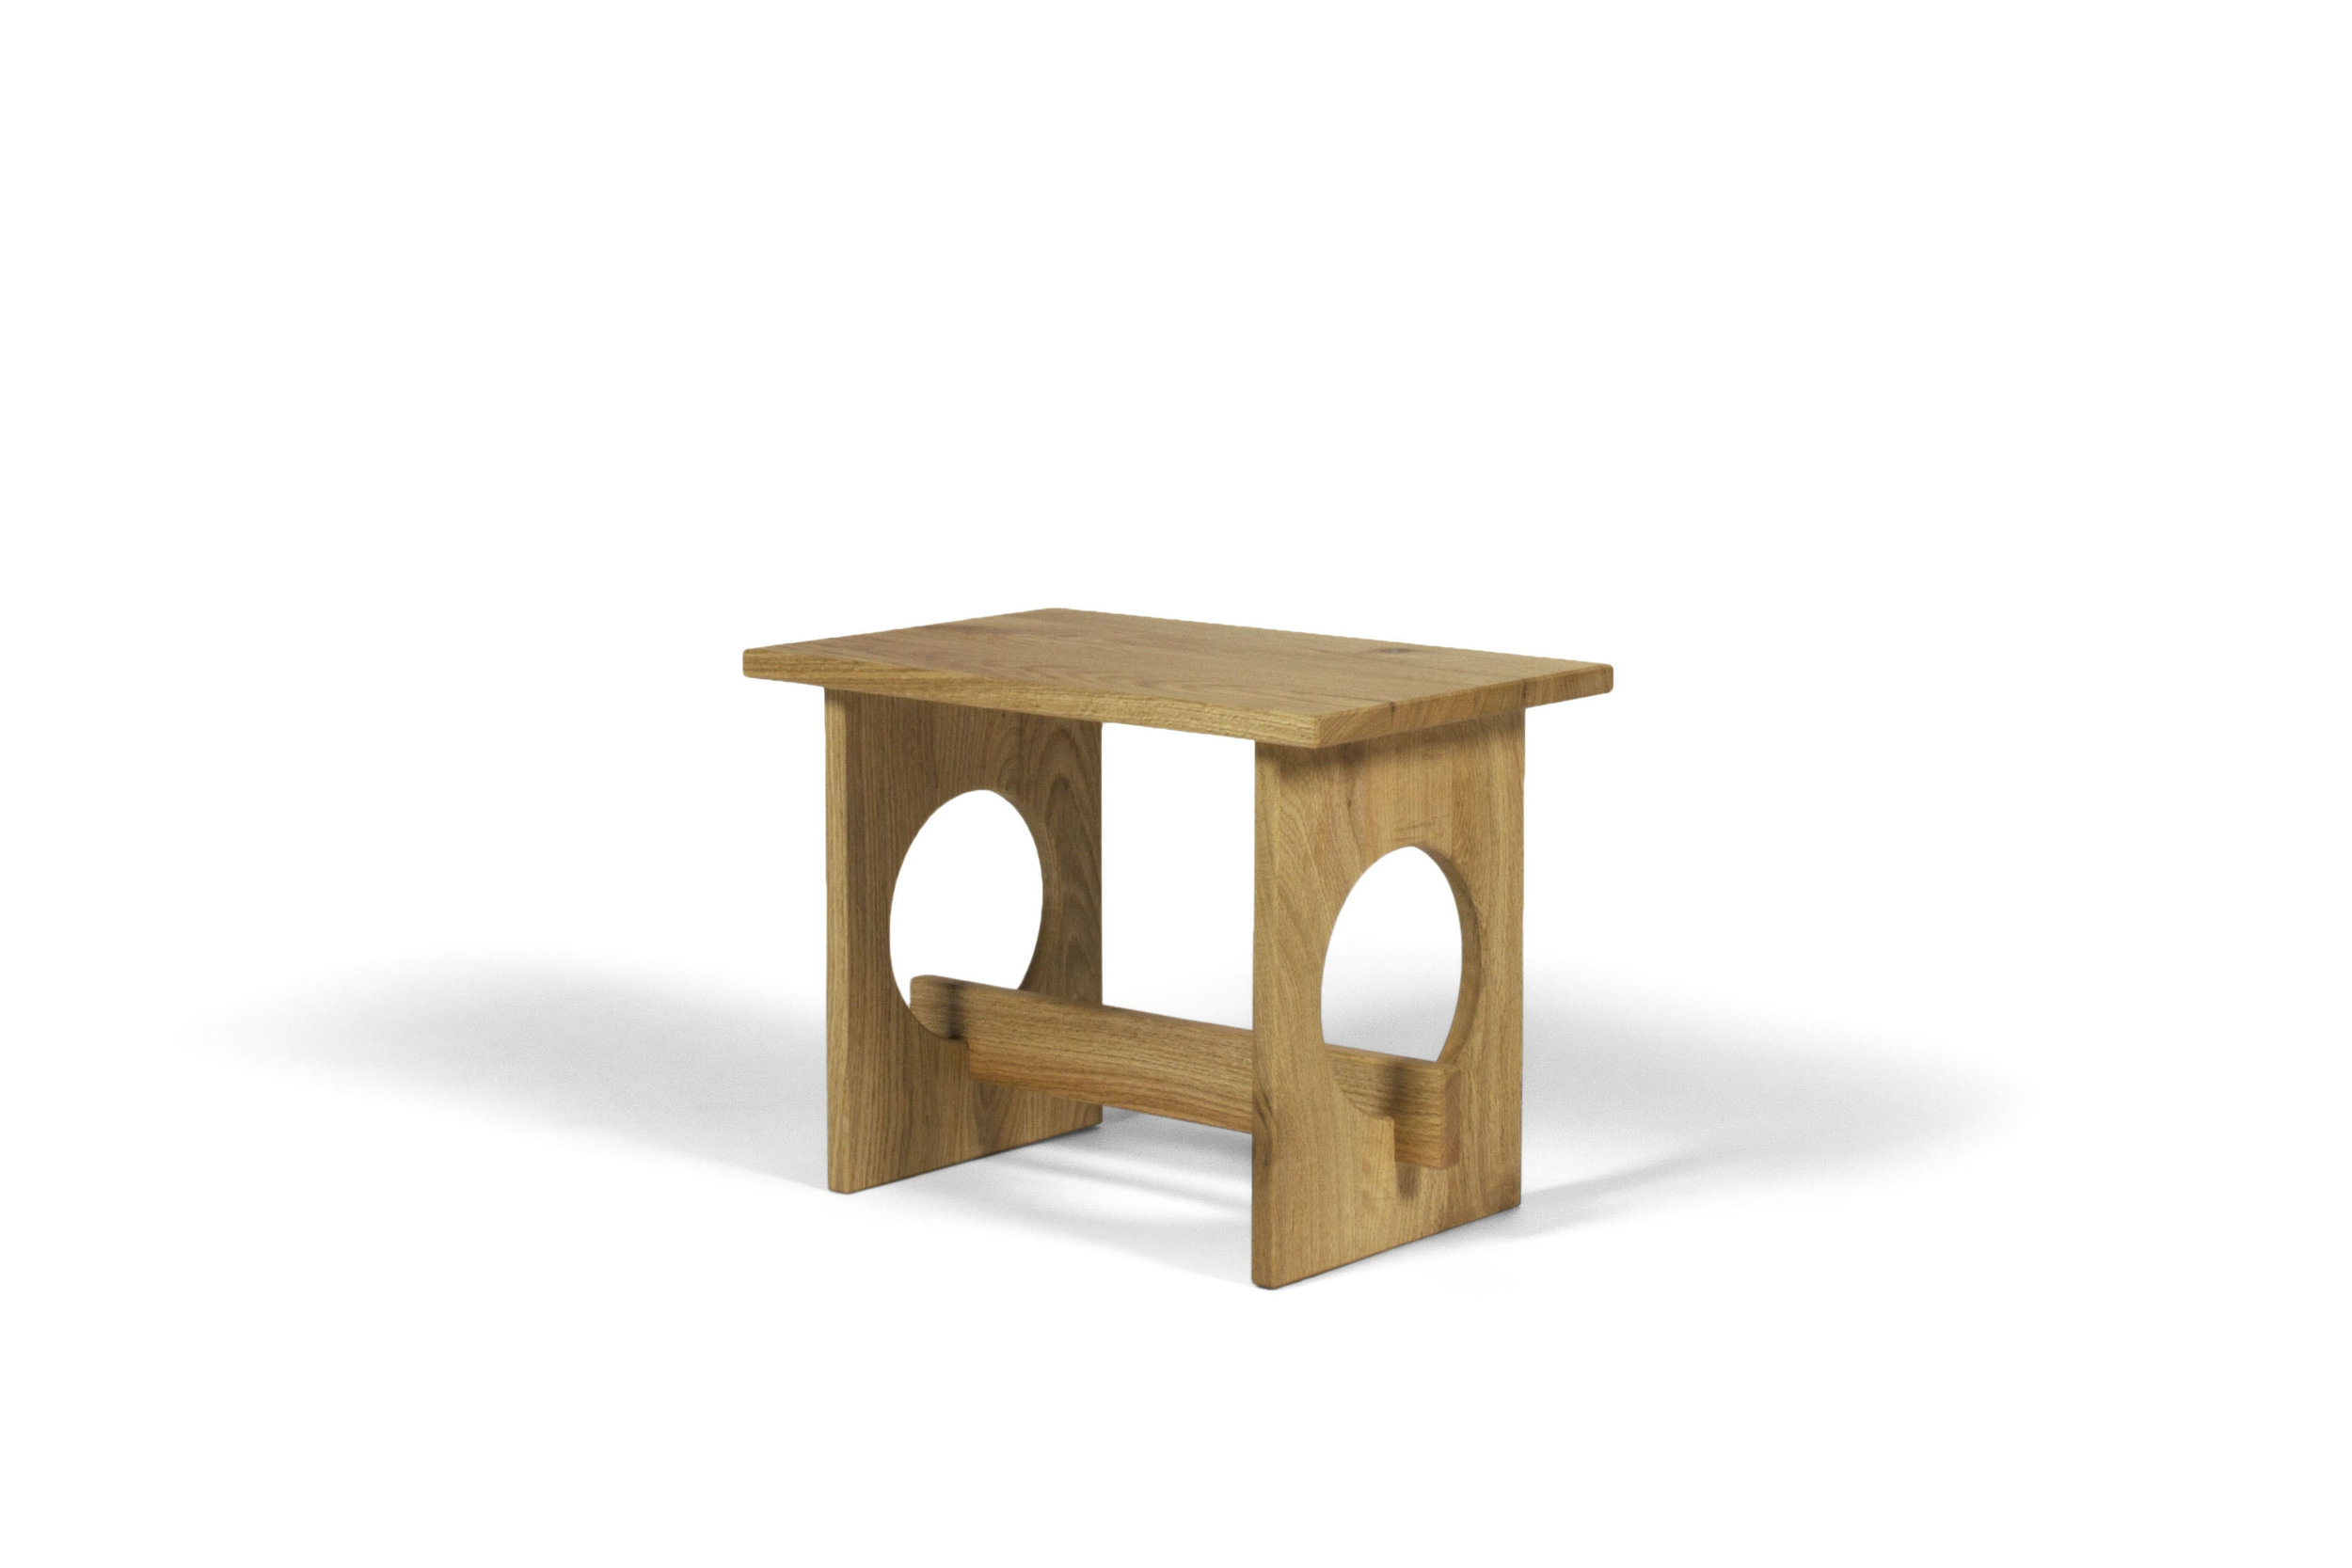 stools natrul2.jpg